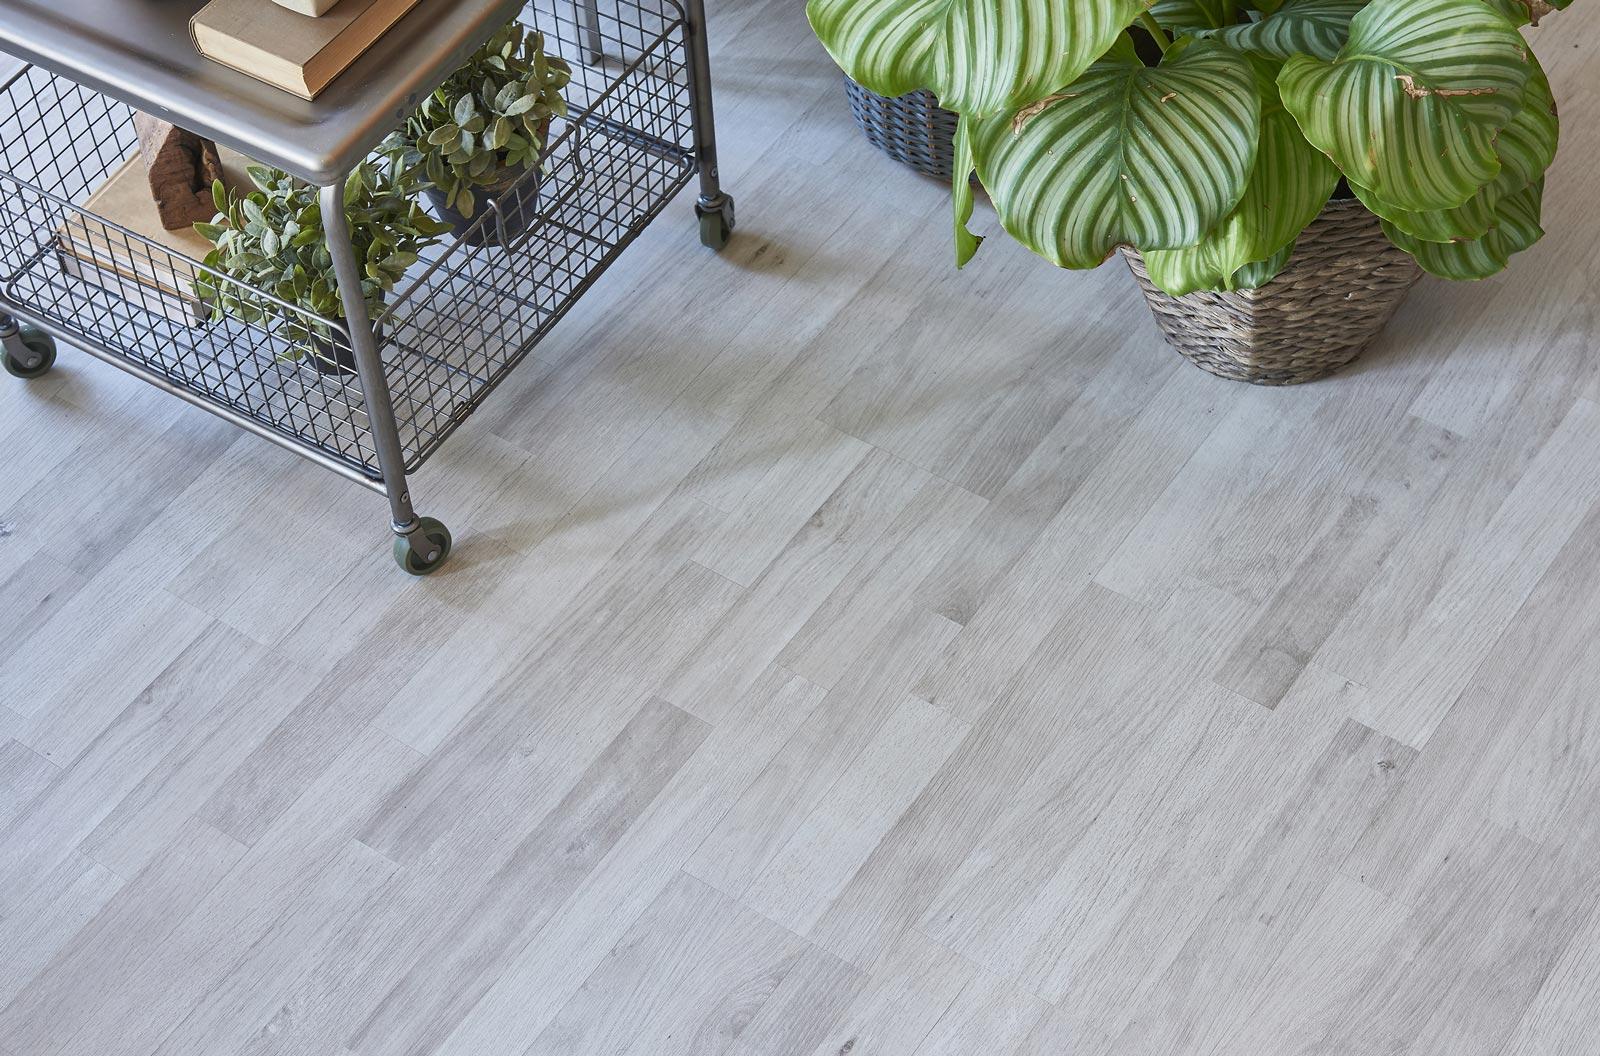 Vinyl Flooring Brisbane Affordable Amp Durable Bennetts Carpets